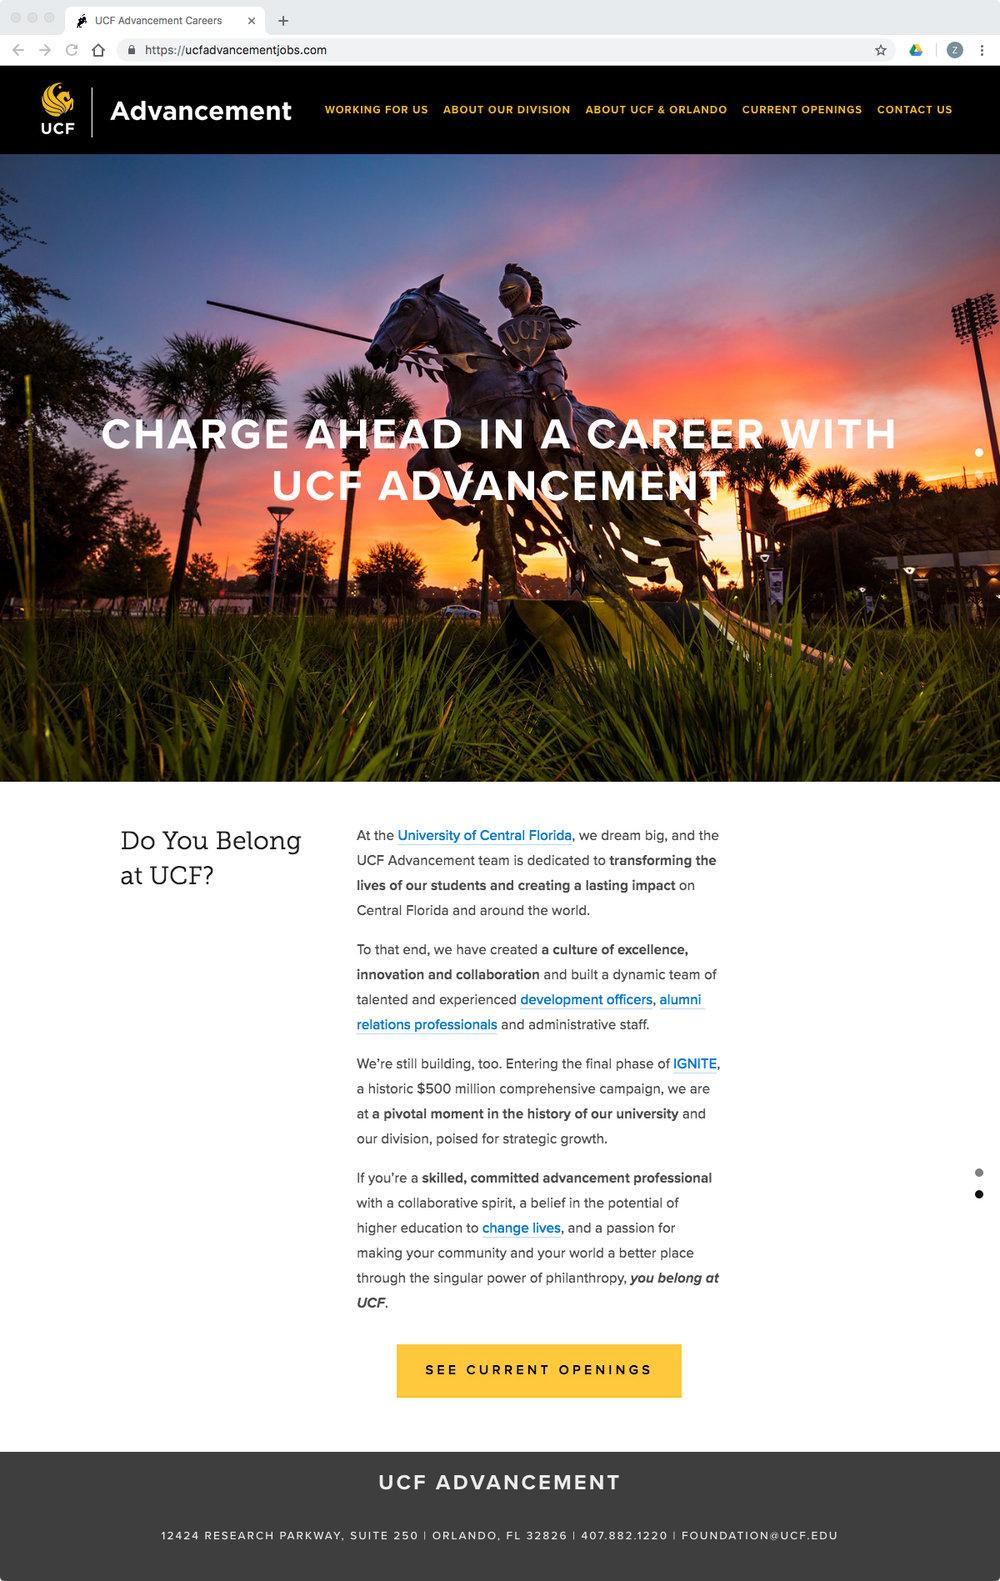 ucf-adv-jobs-home.jpg